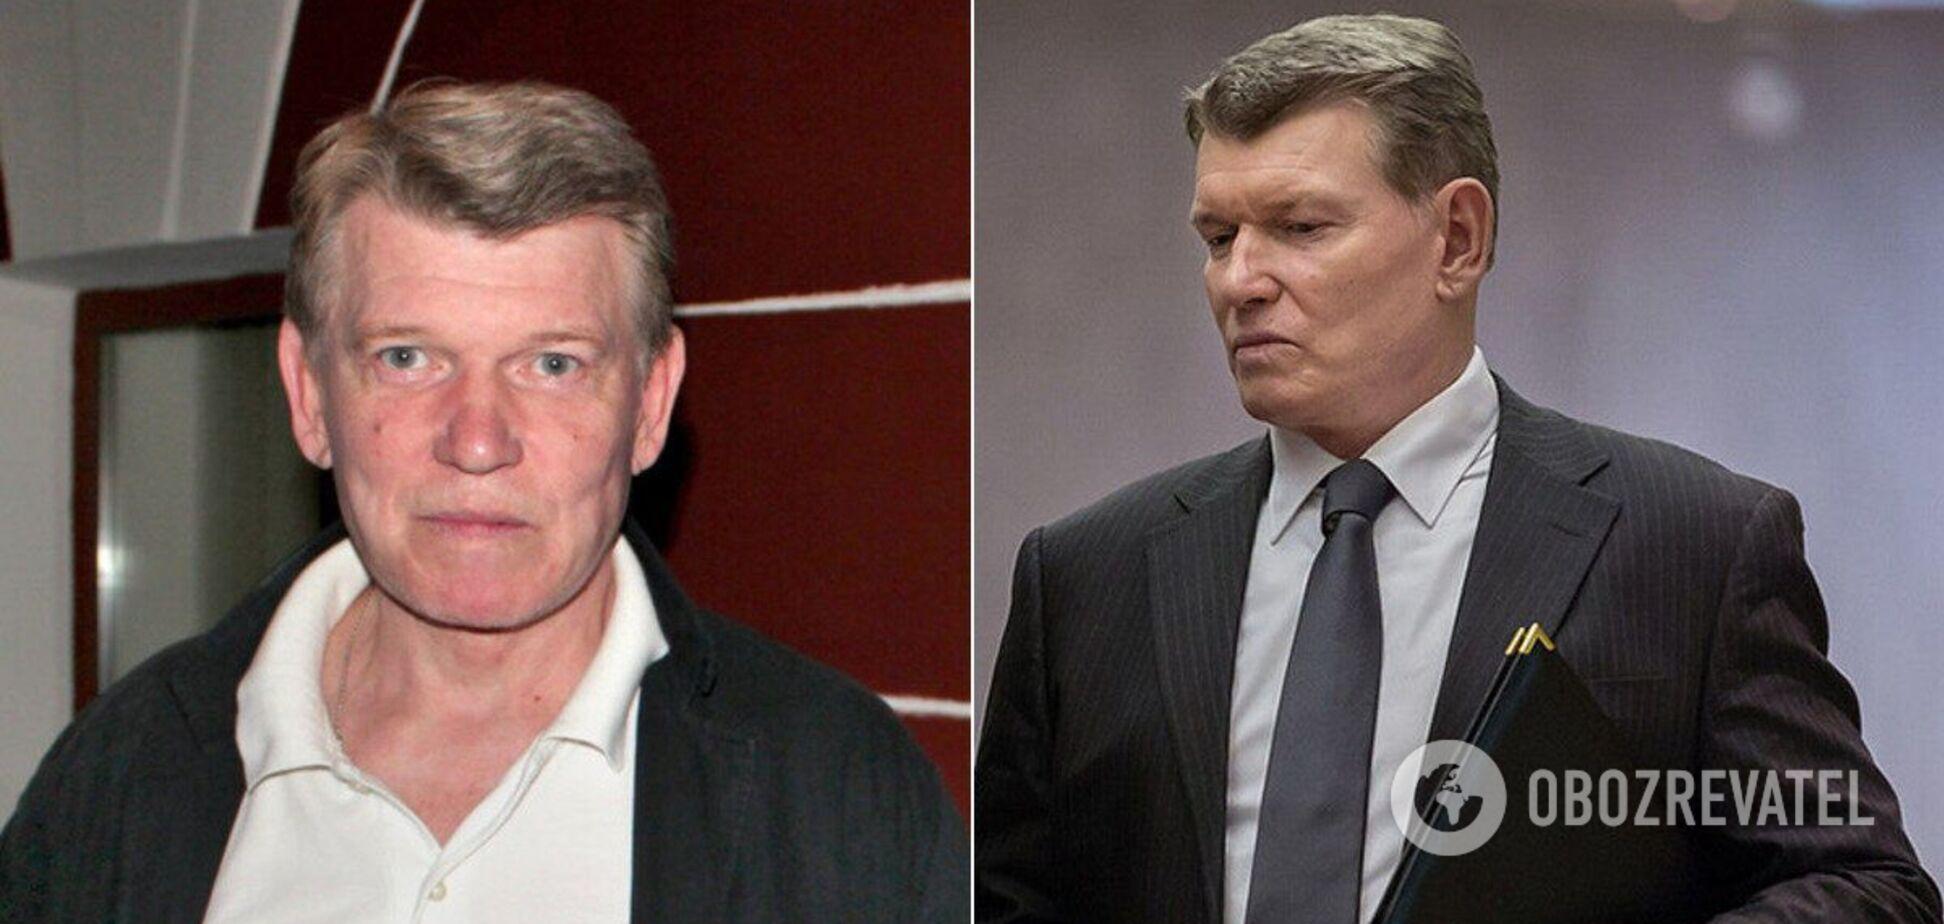 Умер актер из 'Антикиллера' и 'Ликвидации' Юрий Лахин